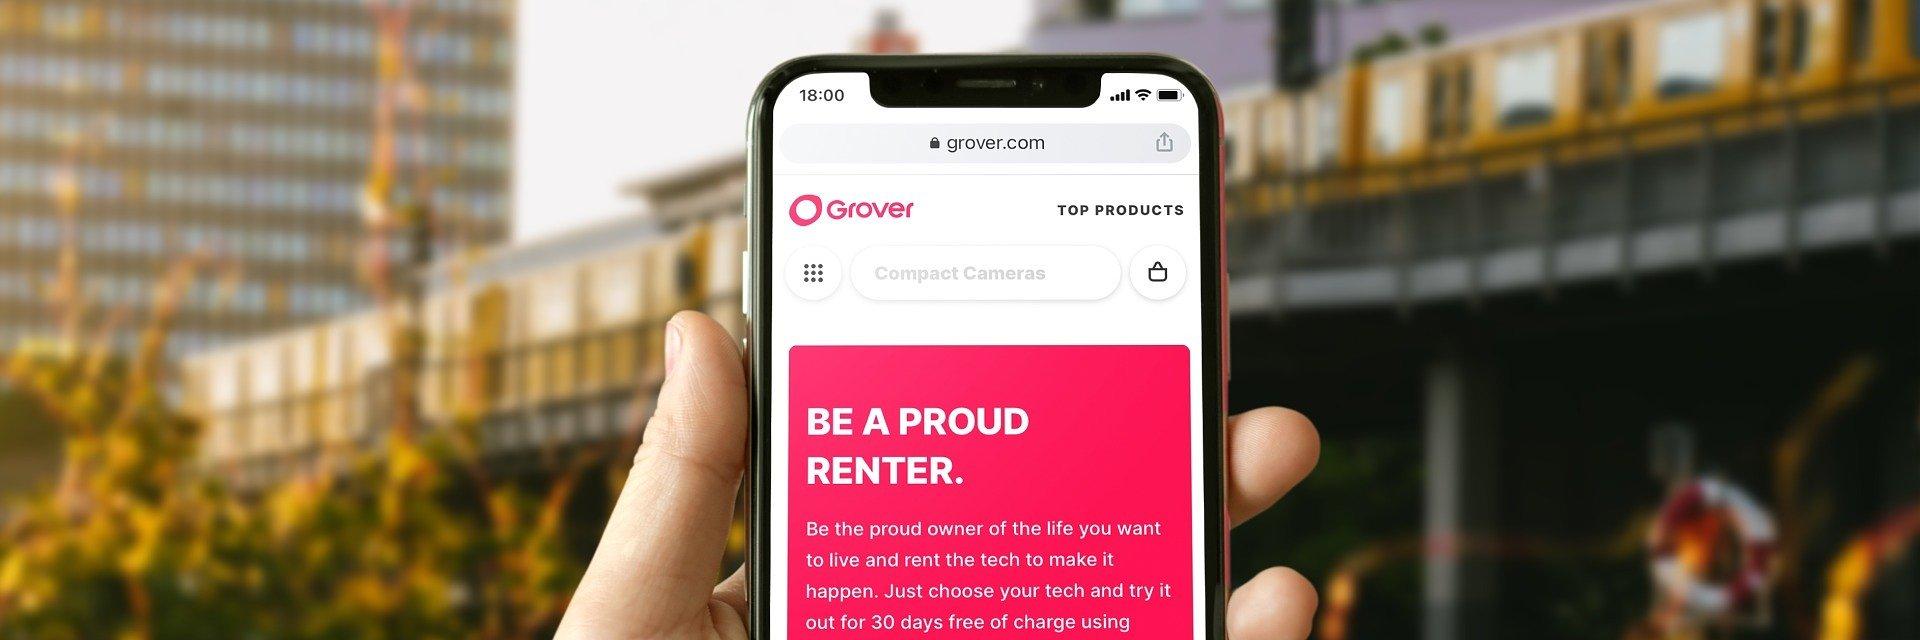 Grover secures $1bn to democratize access to consumer tech